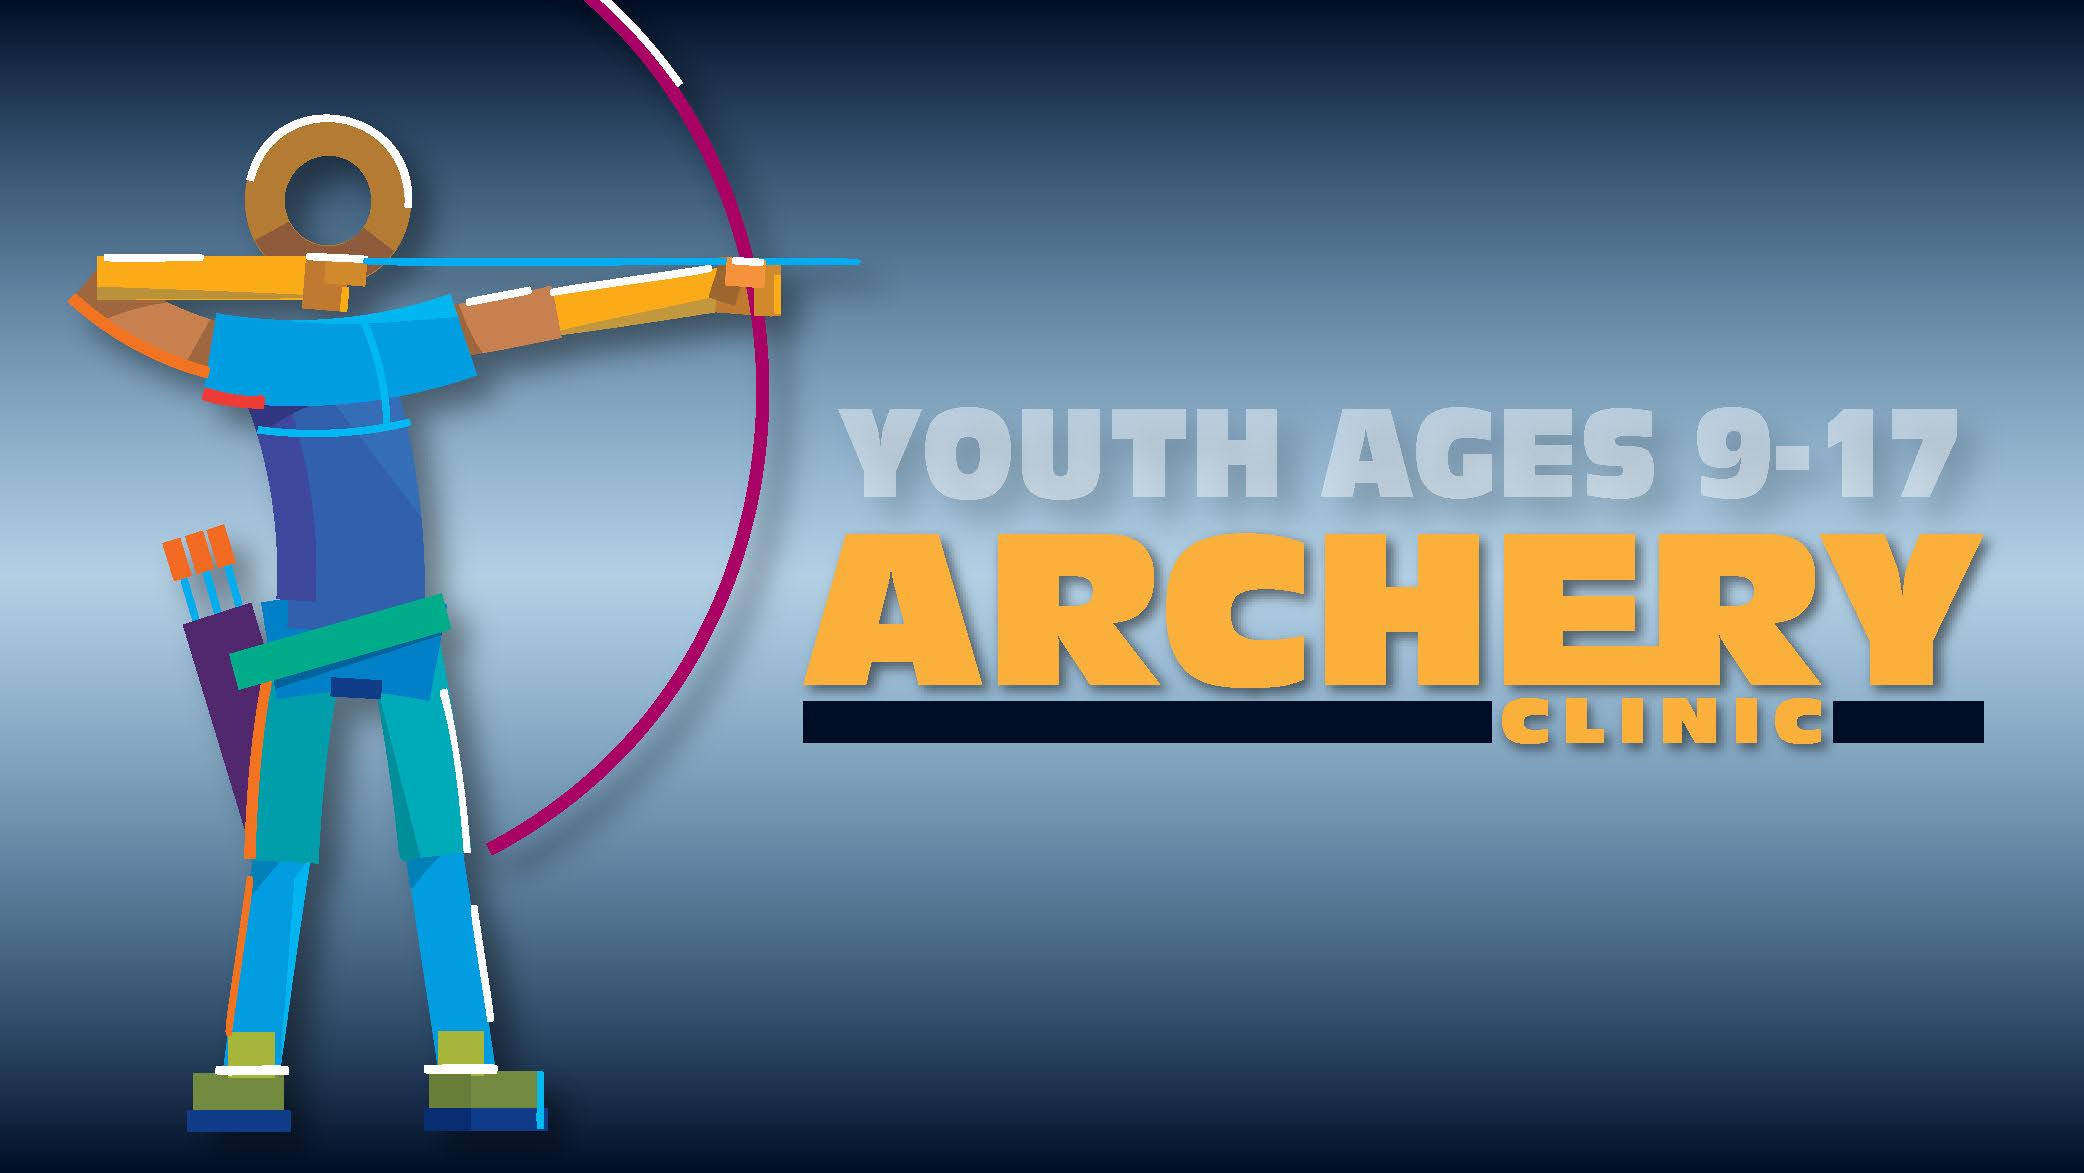 Spring Break Youth Archery Clinic